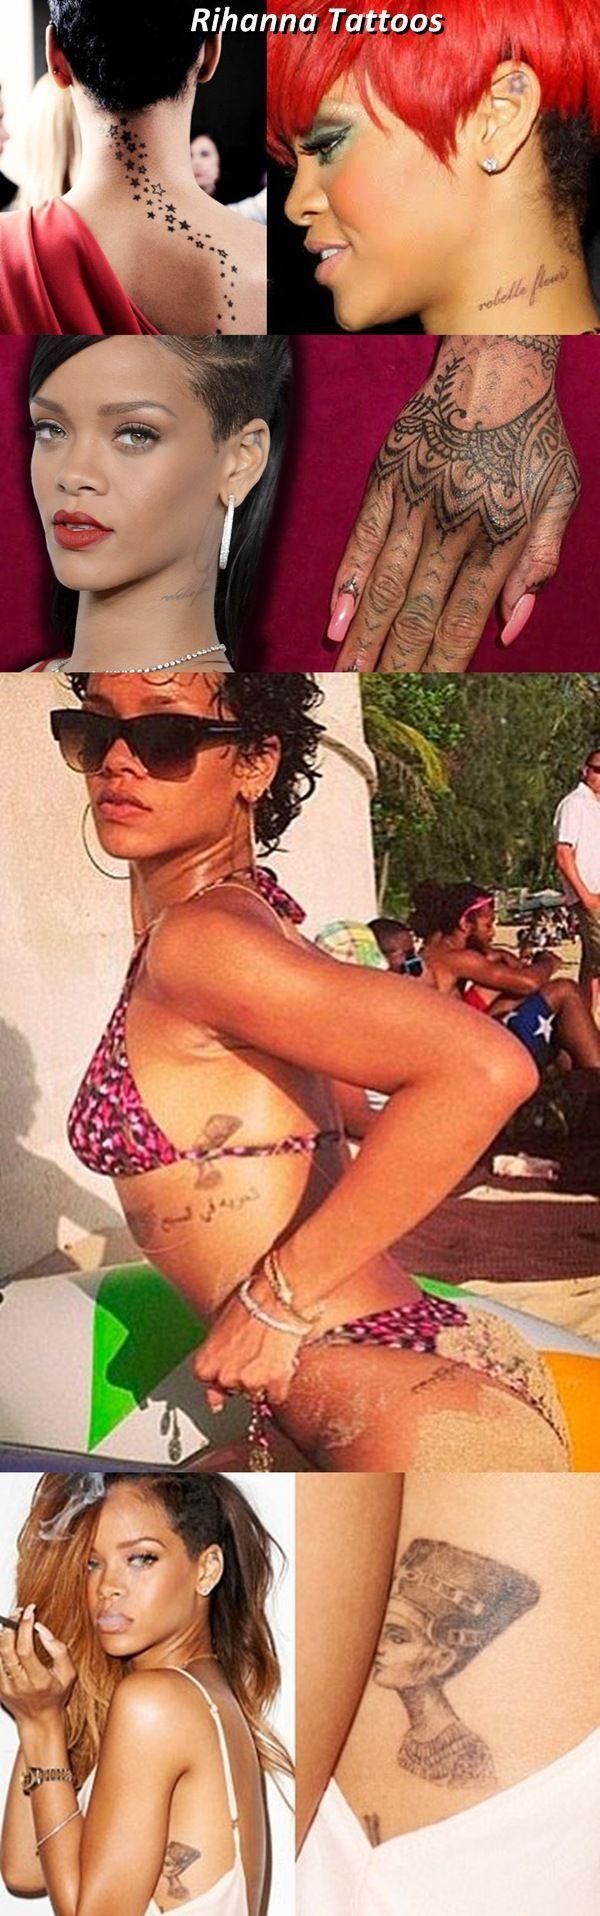 Rihanna Tattoos Collection